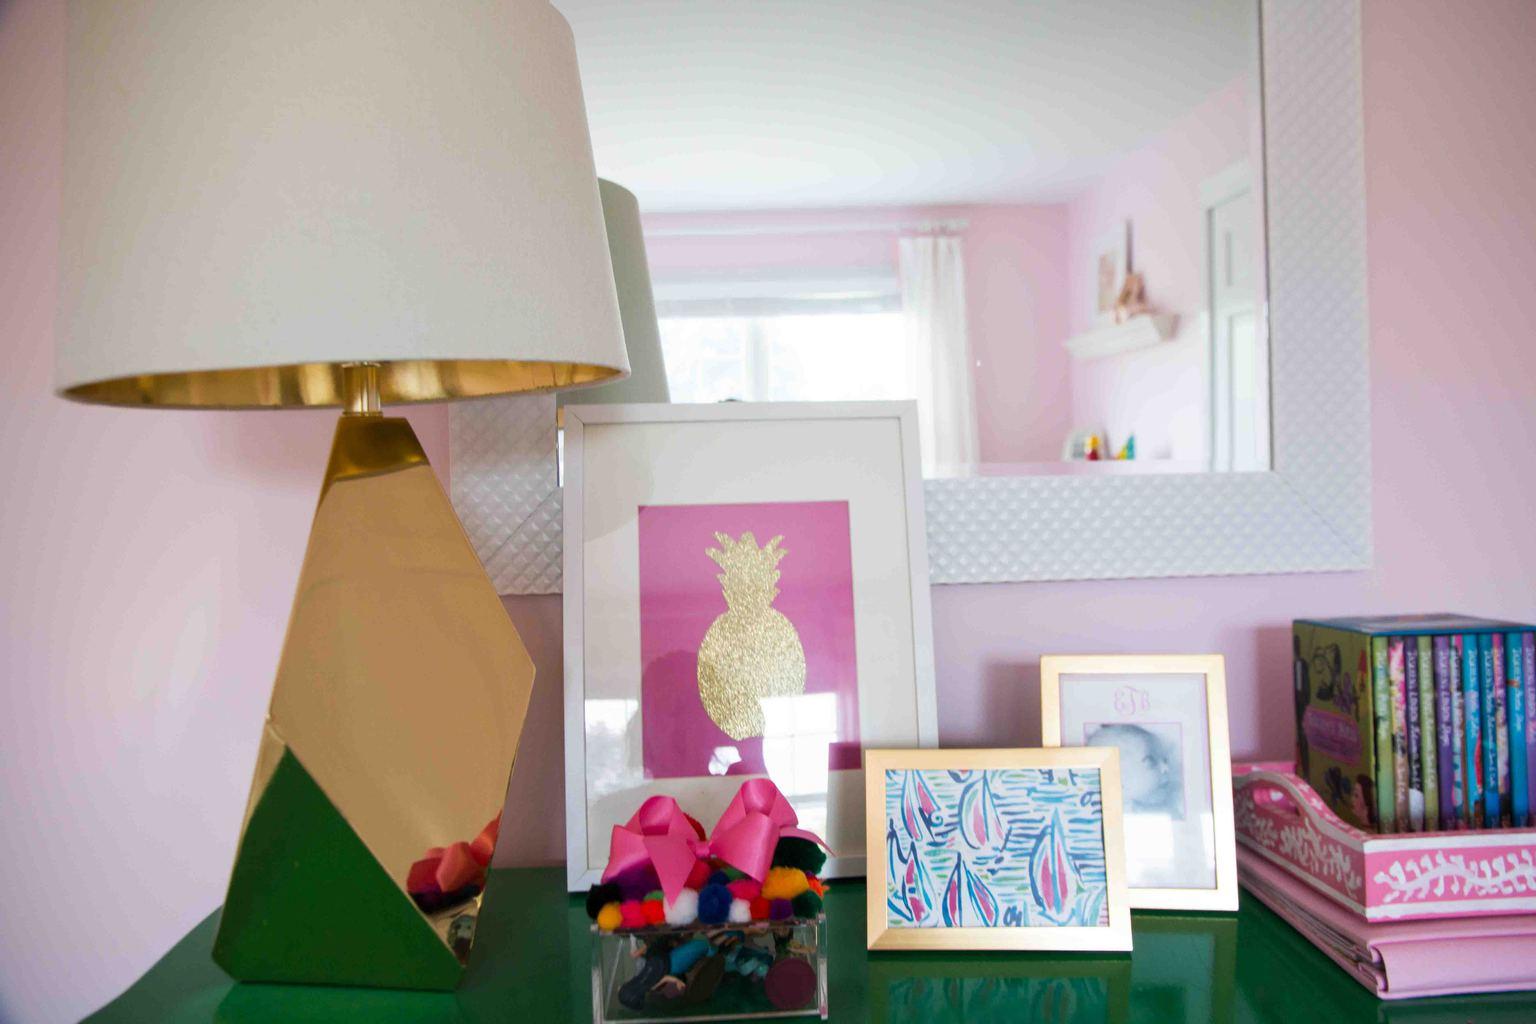 Budget Friendly art | Budget friendly artwork for your home| Easy DIY art